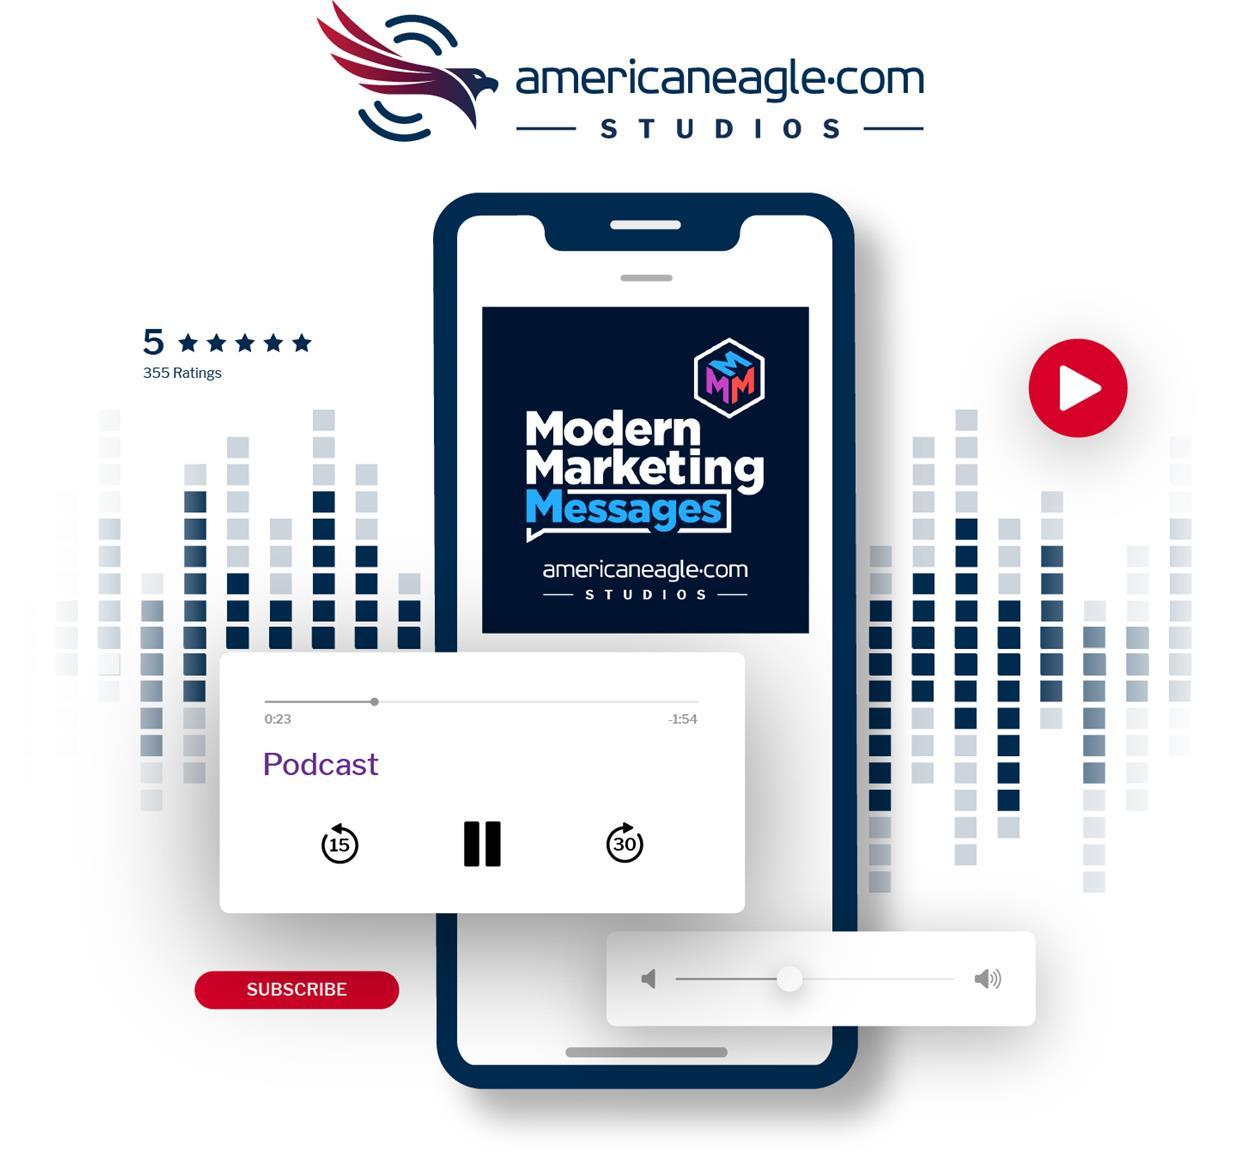 Americaneagle.com Studios